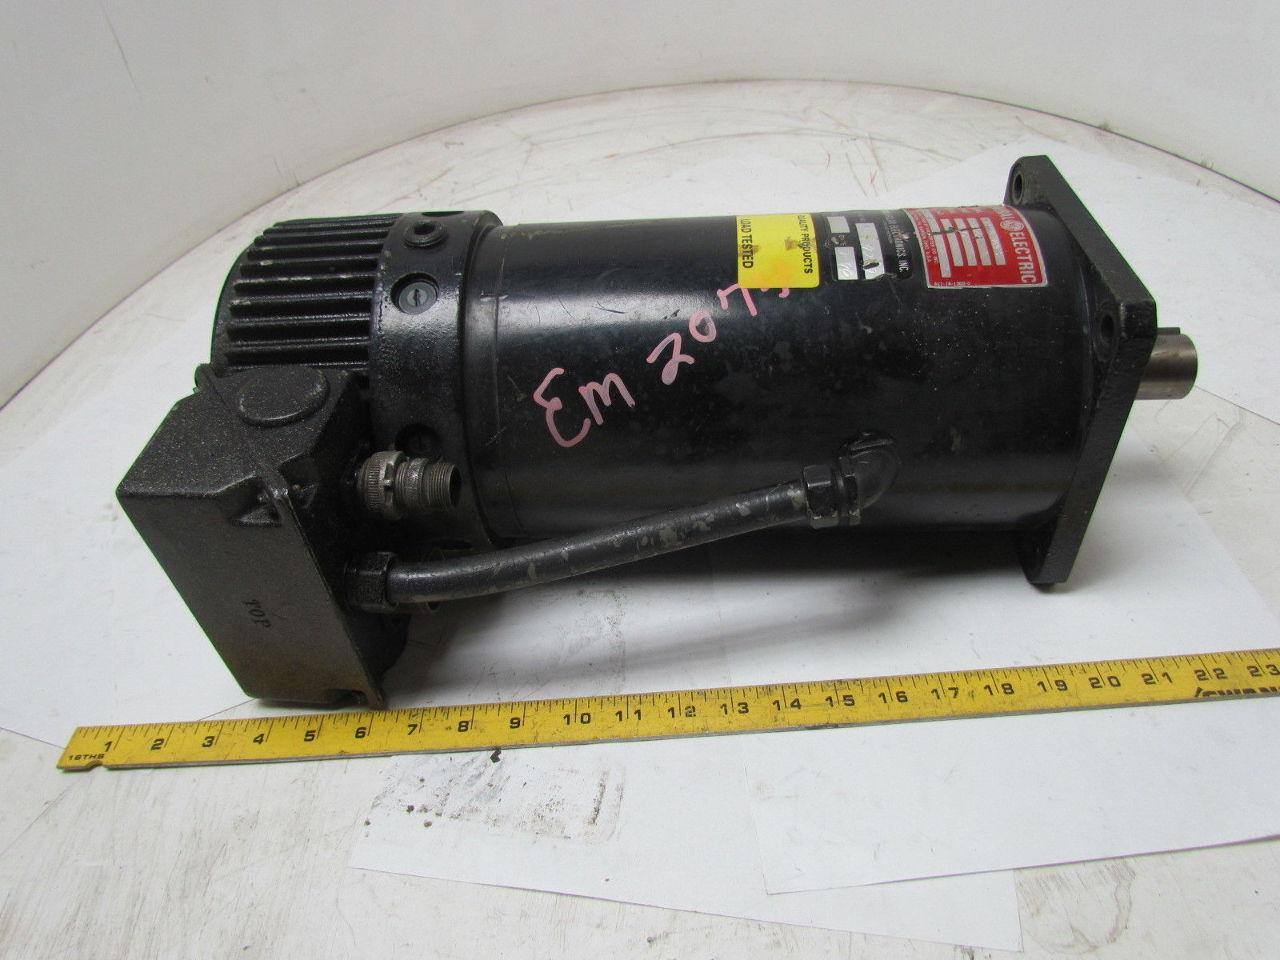 Ge general electric 183 18 1269 0 dc servo motor by hk for Ge motor parts online